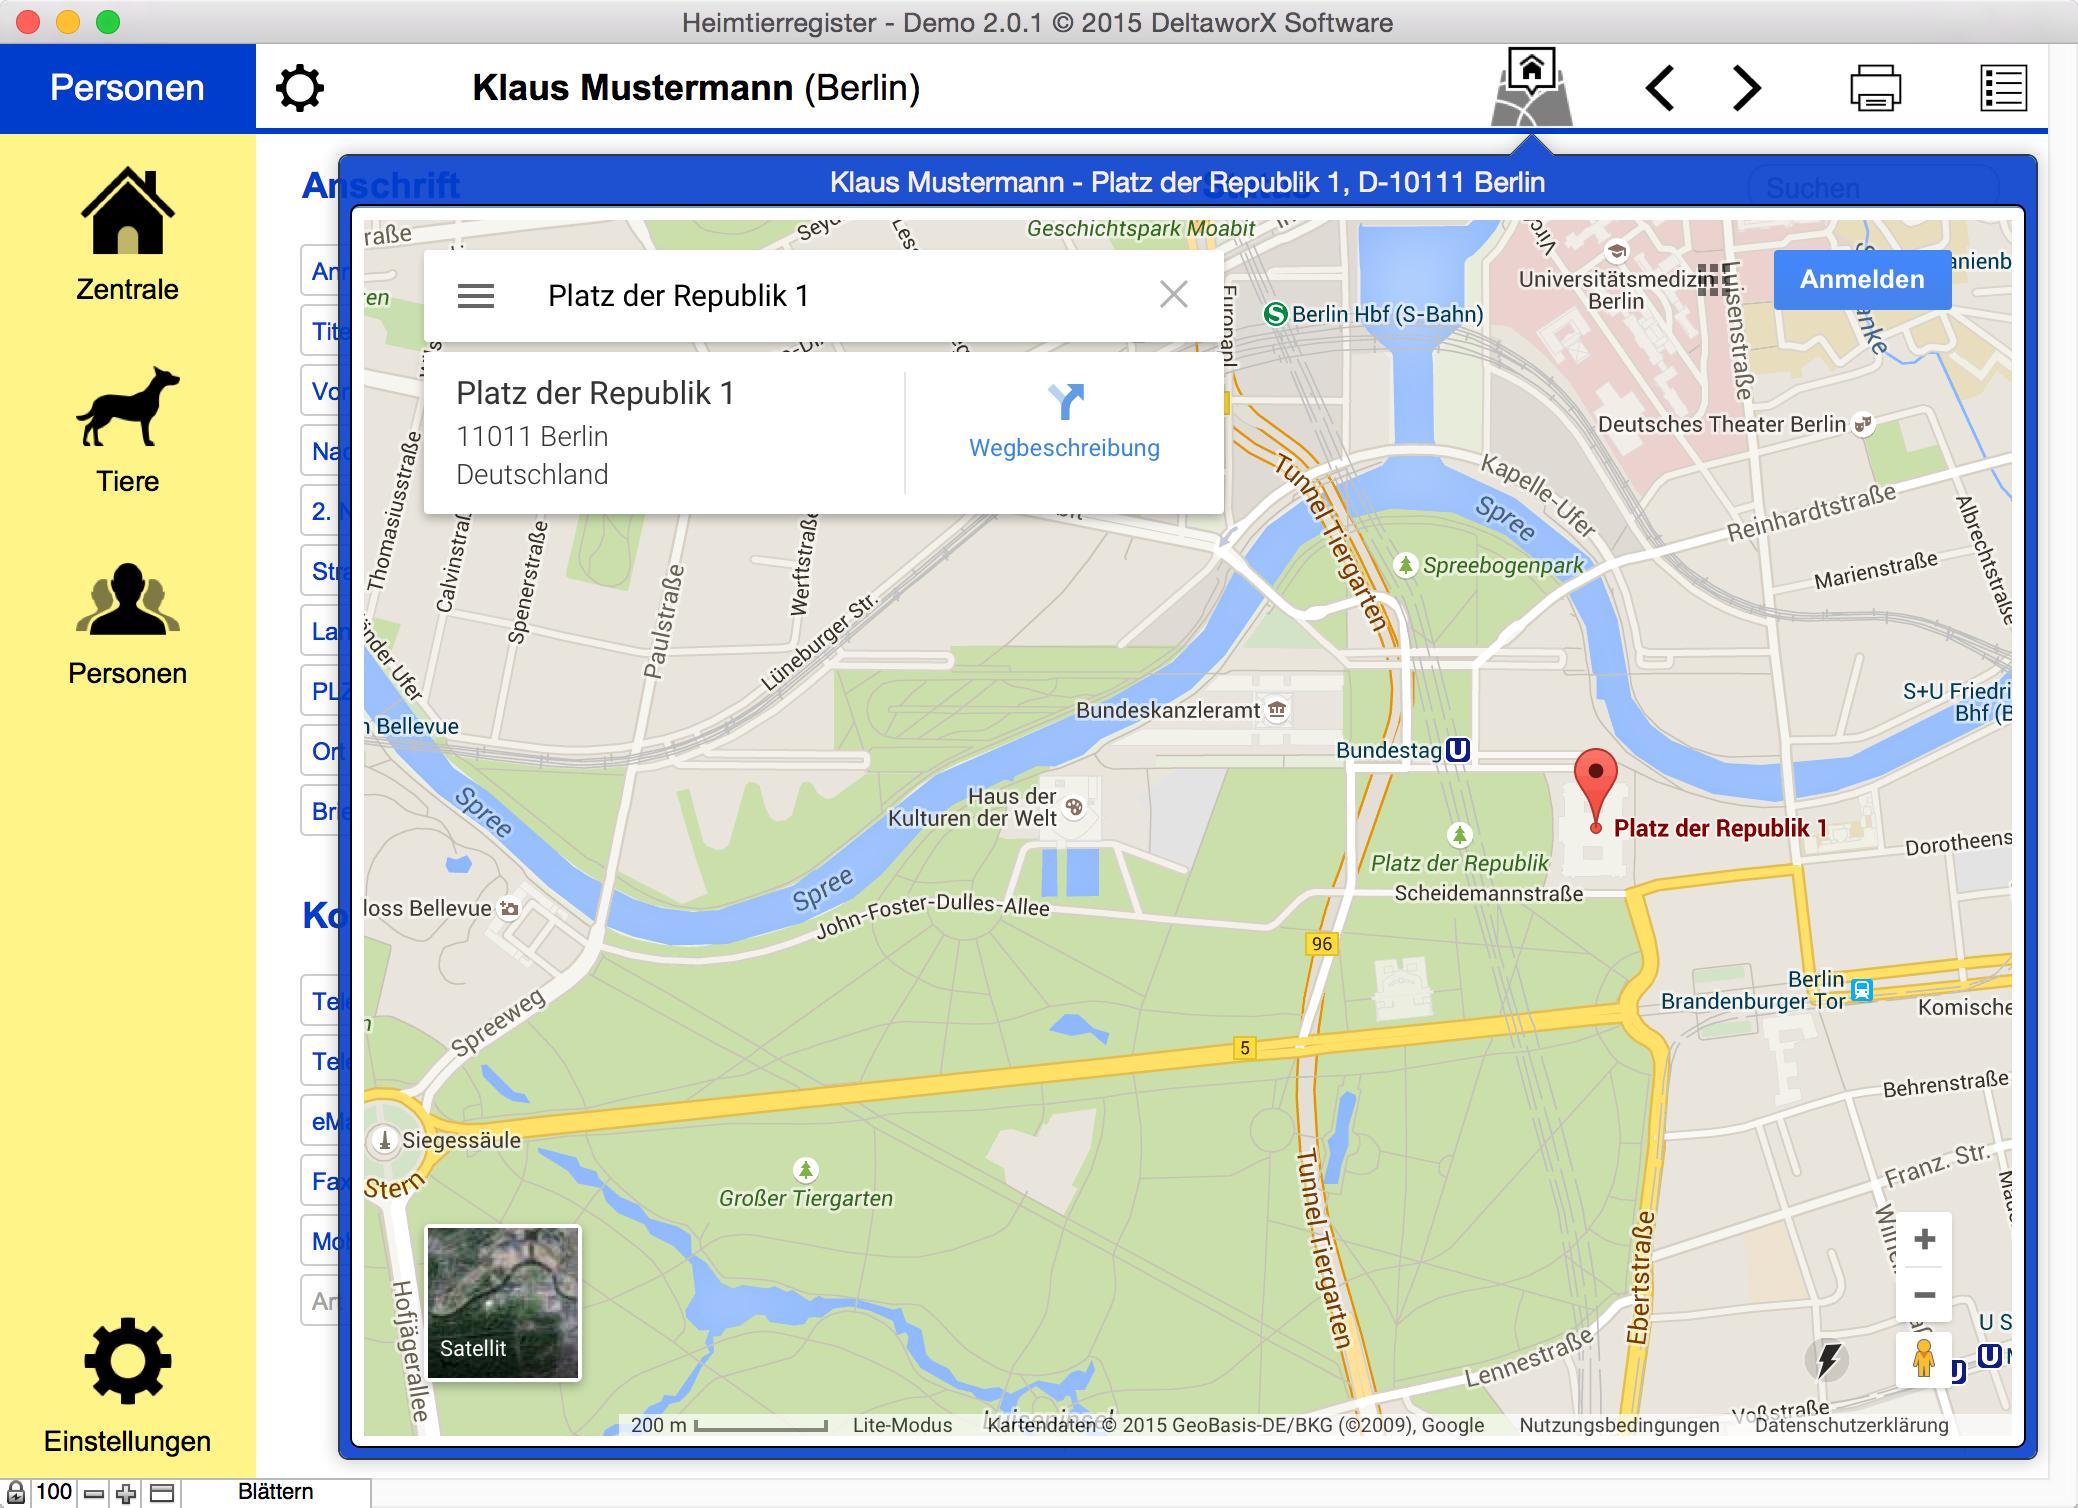 htr2_Personen_Karte